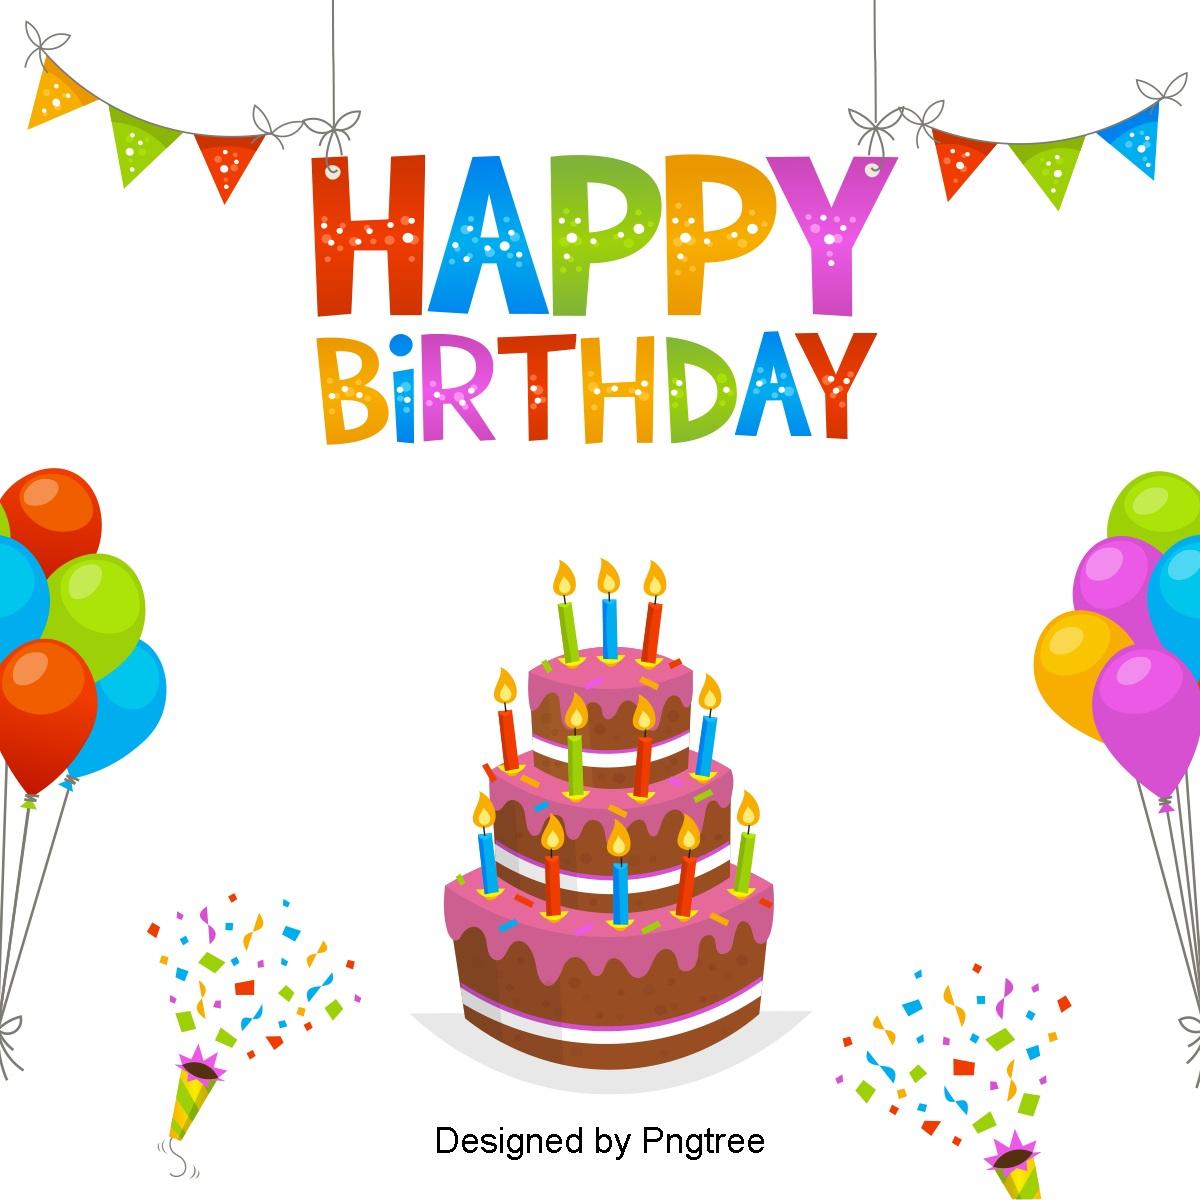 Multi Layer Birthday Cake, Birthday Clipart, Cake Clipart, Vector.